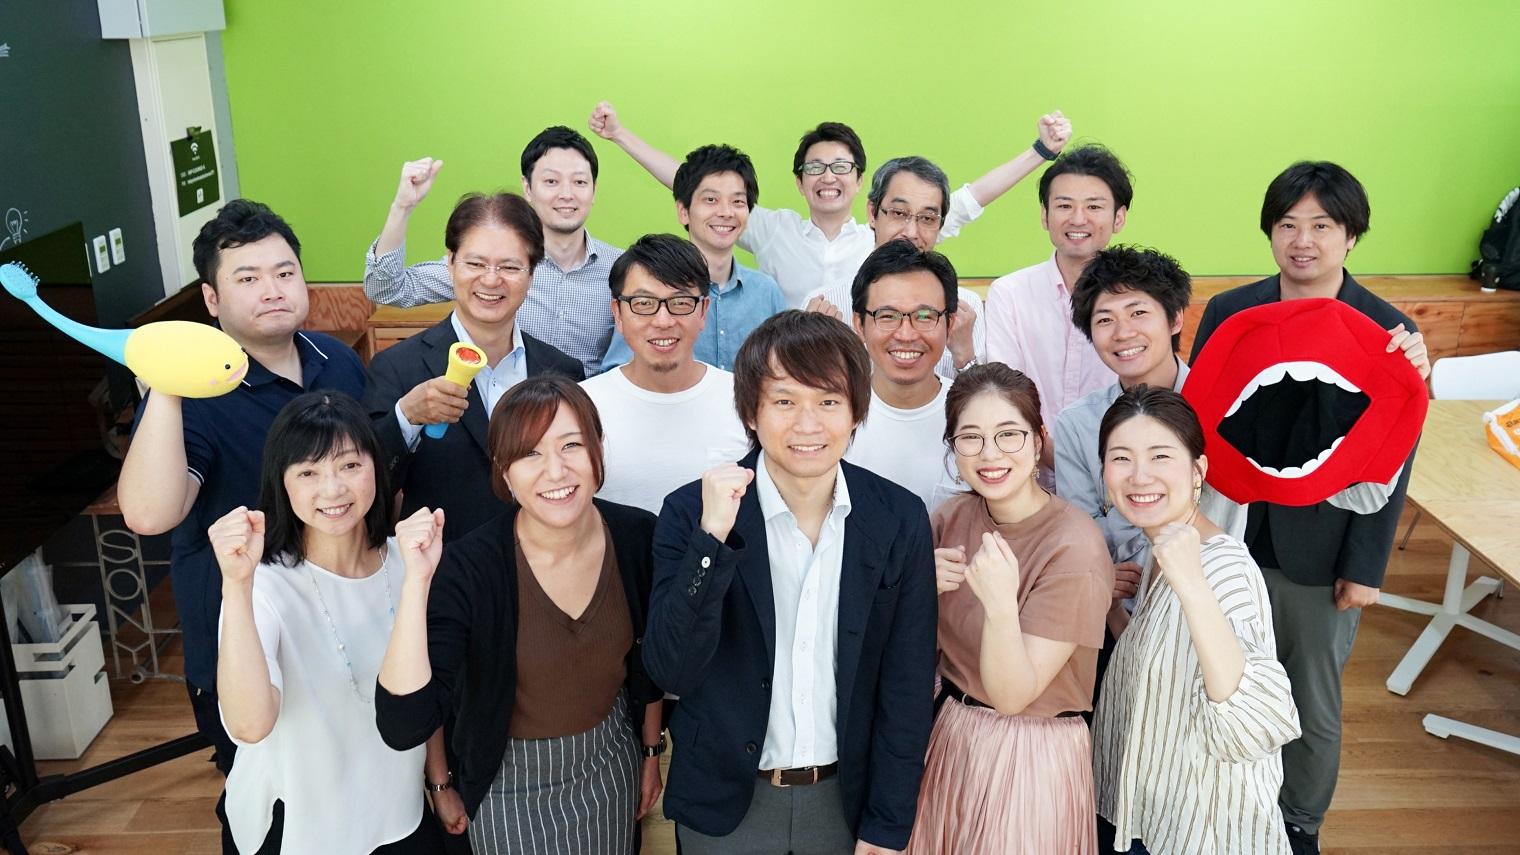 Possiプロジェクトに関わった京セラ株式会社・ライオン株式会社・ソニーのメンバー集合写真